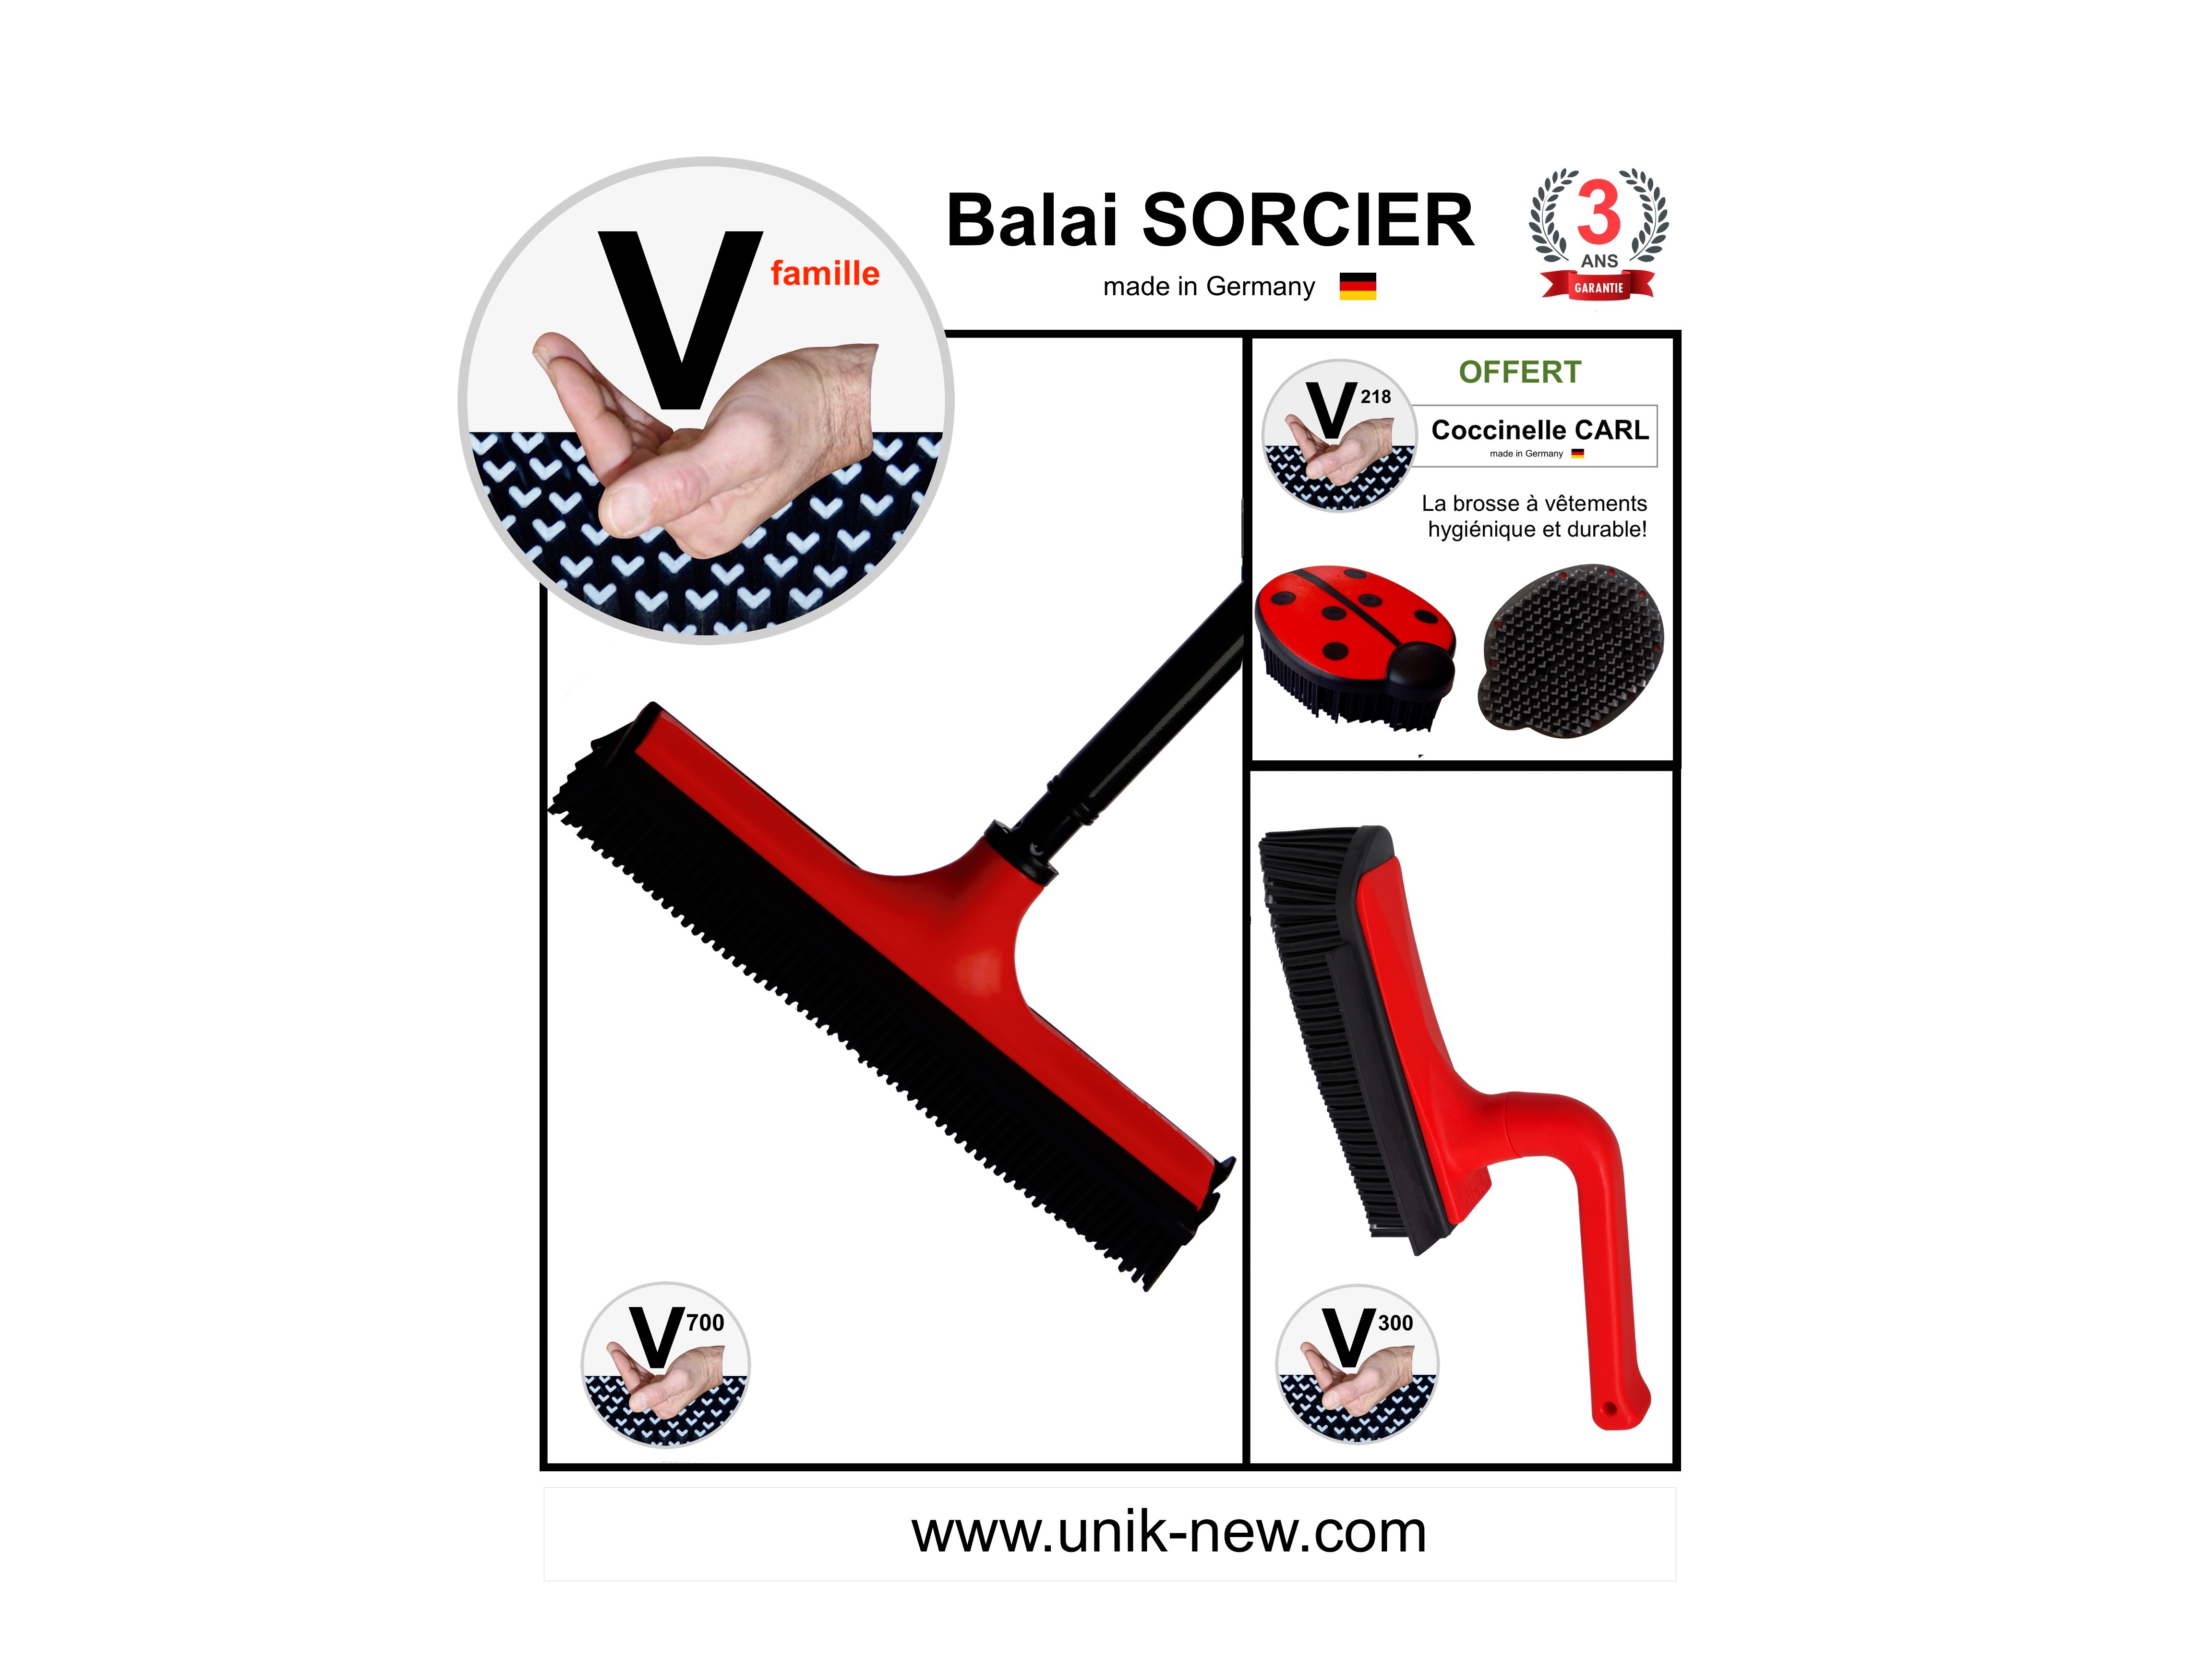 Kit Balai SORCIER V famille rouge. Balai V700 picots